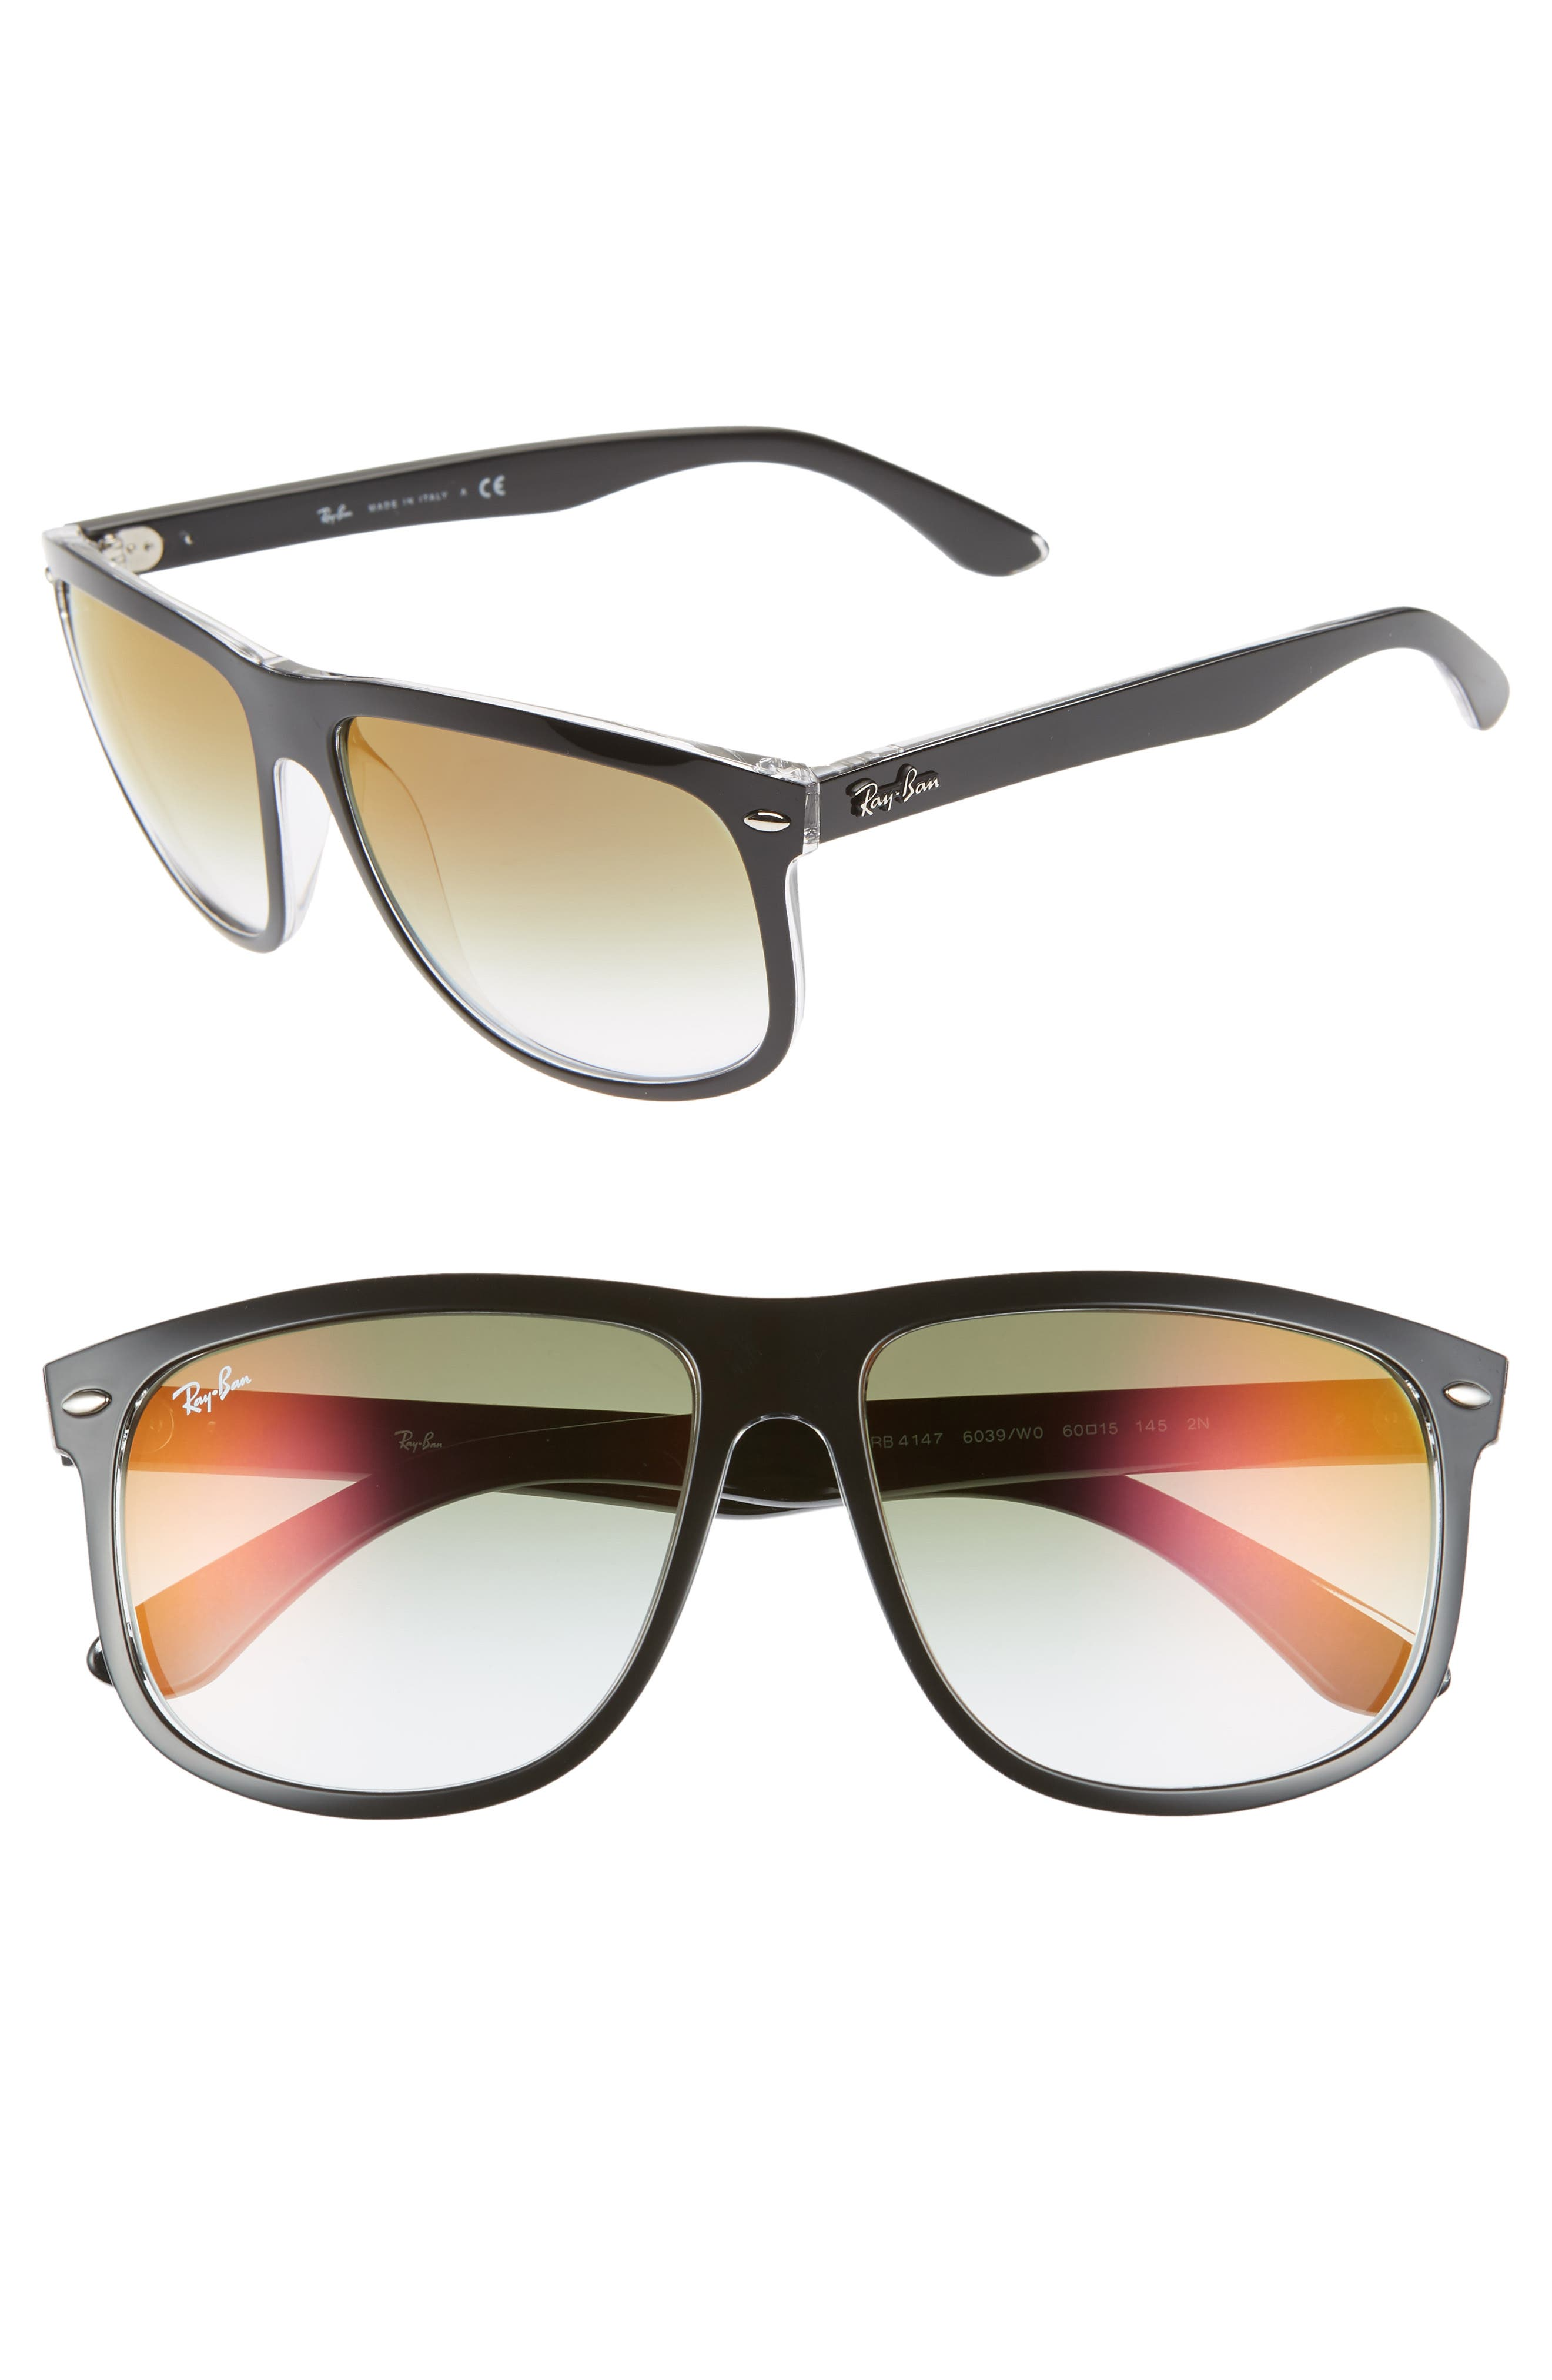 Ray-Ban 60Mm Mirrored Sunglasses - Shiny Black Gradient Mirror